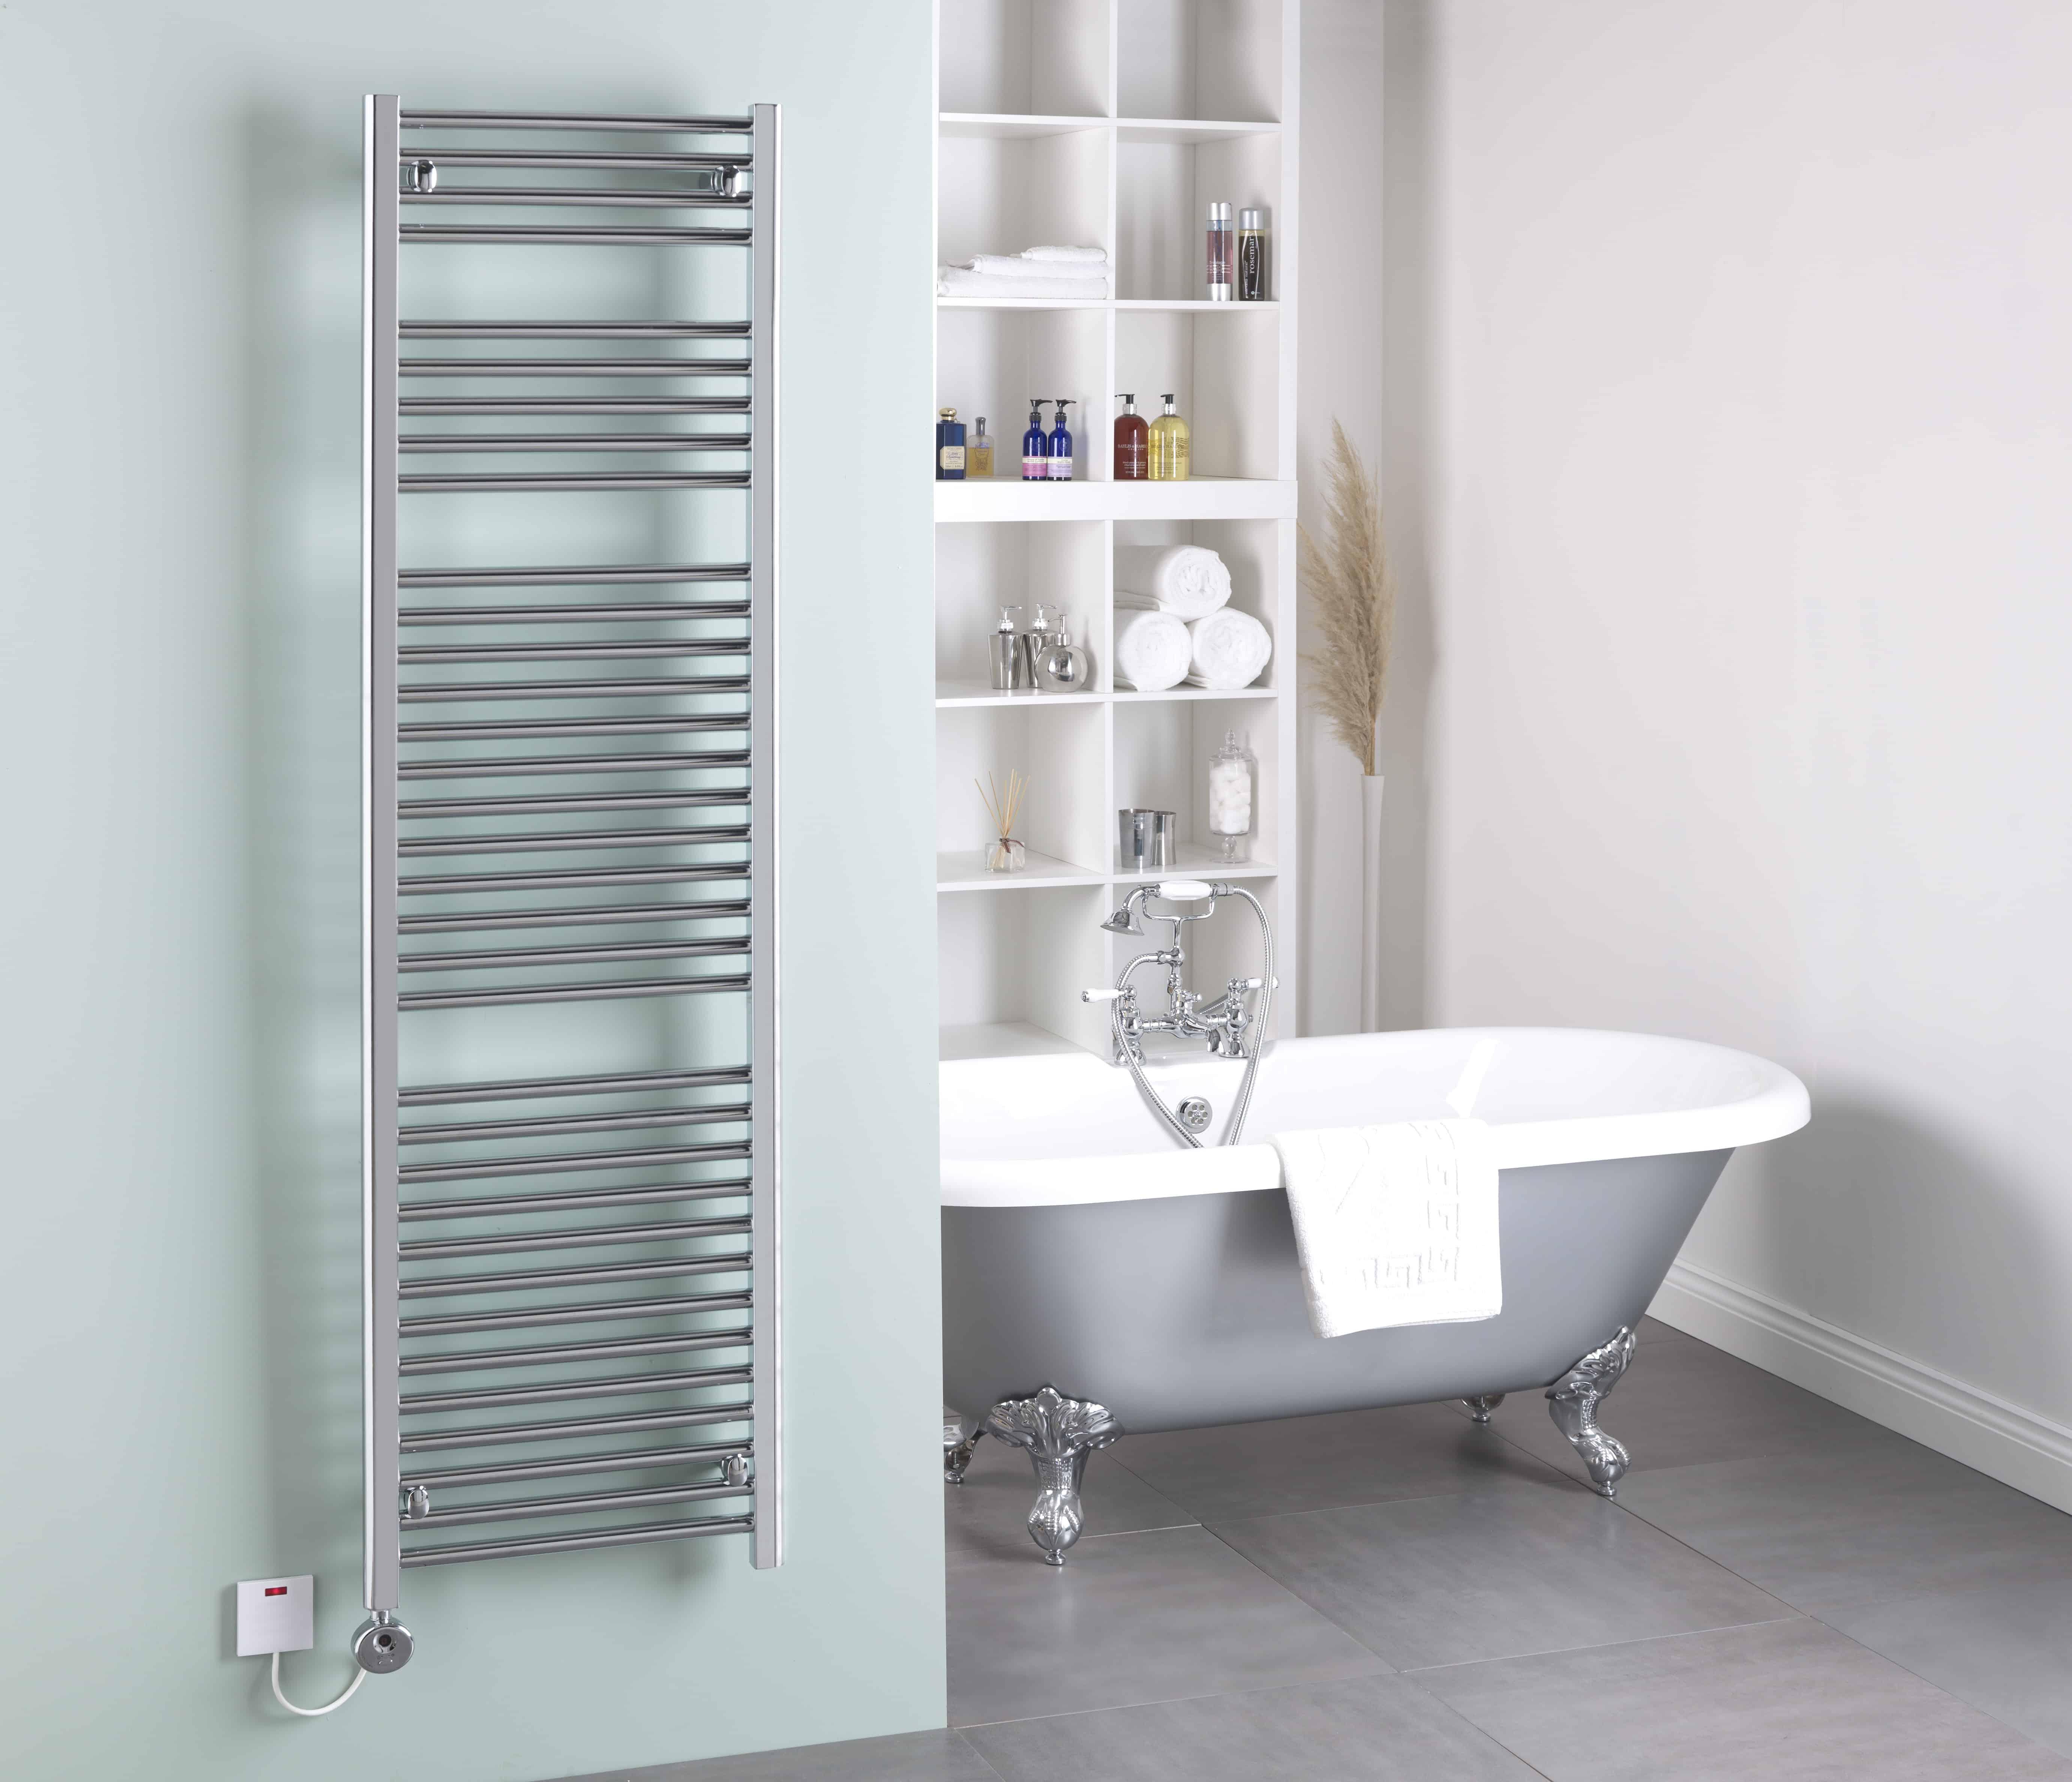 650x400mm Electric Straight Heated Towel Rail: Straight Chrome Thermostatic Electric Heated Towel Rail